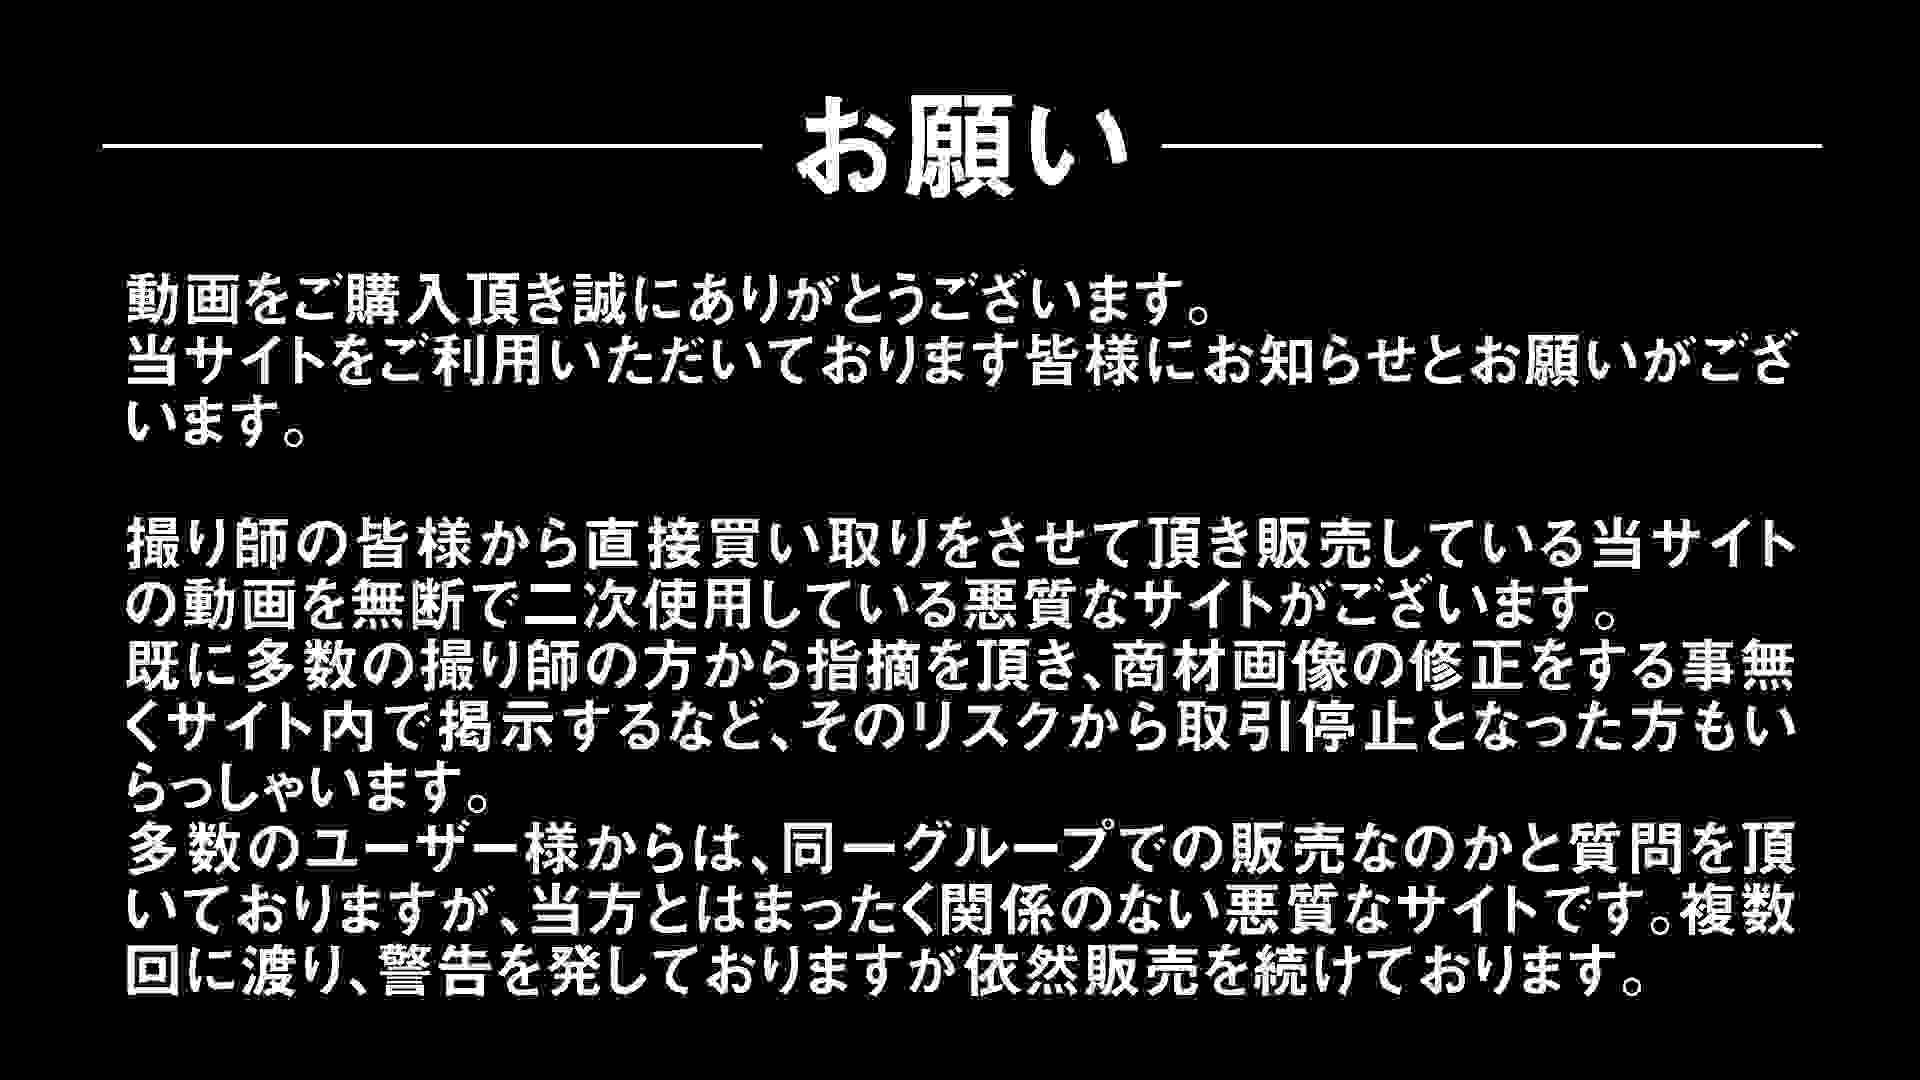 Aquaな露天風呂Vol.301 OLのエロ生活 すけべAV動画紹介 112連発 5